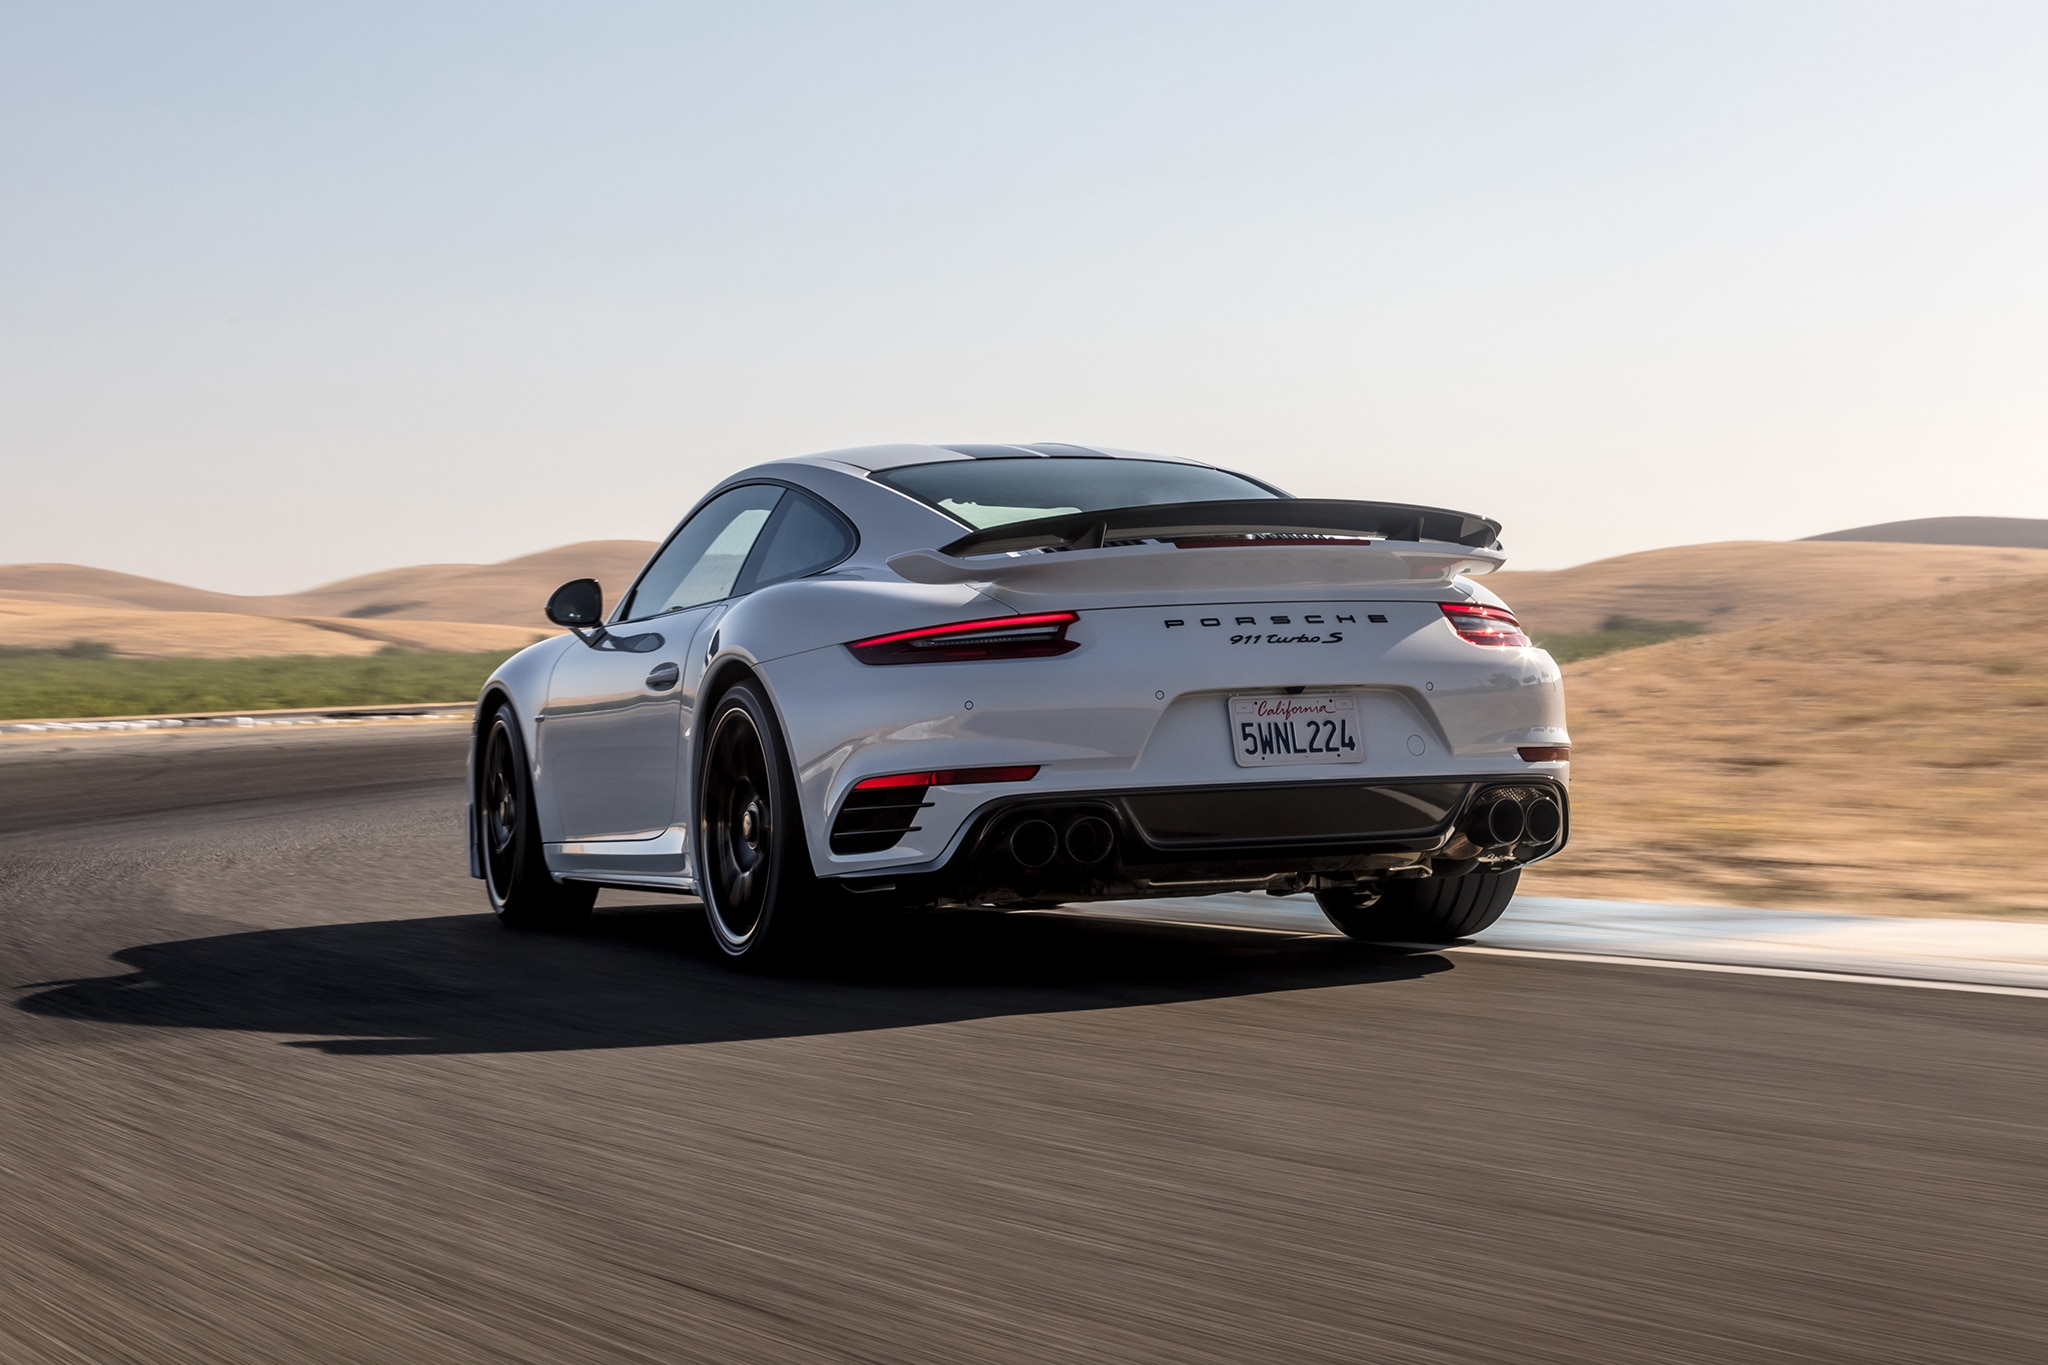 2018 Porsche 911 Turbo S Exclusive Rear Three Quarter In Motion 07